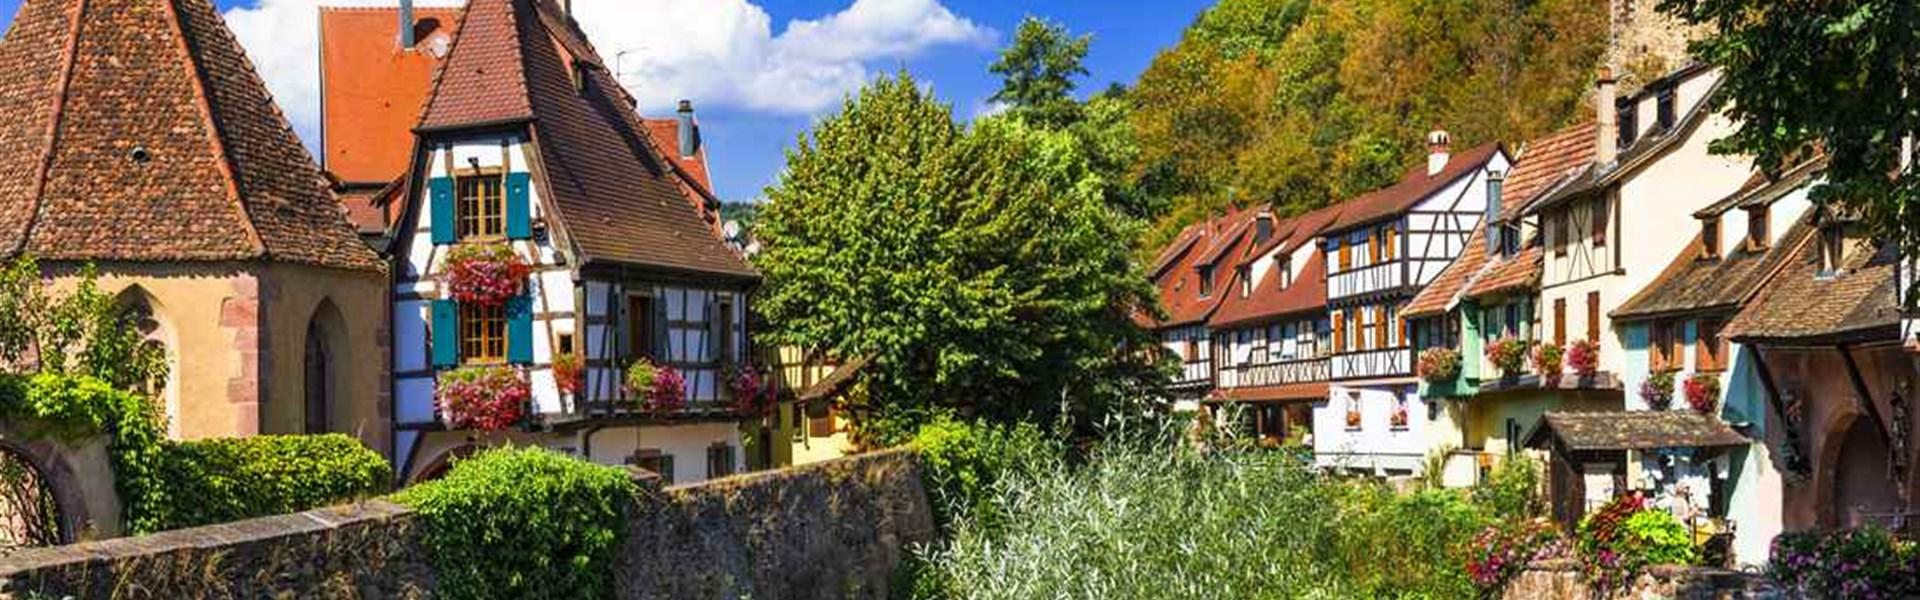 Prodloužený eurovíkend: malebné Alsasko a vinice s průvodcem -